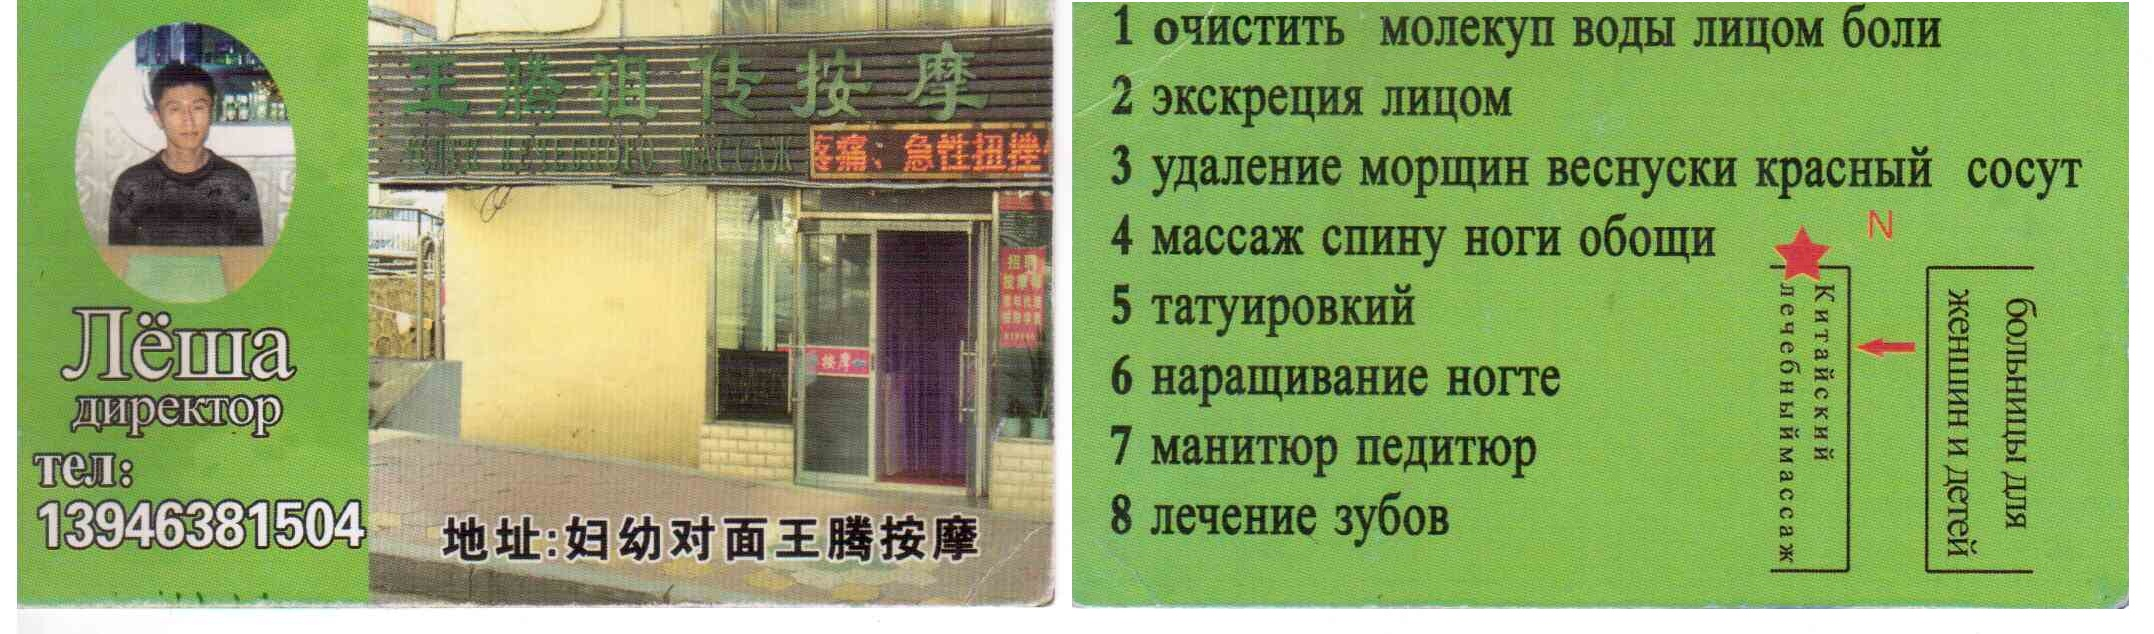 http://forum.mozilla-russia.org/uploaded/vizitka.jpg